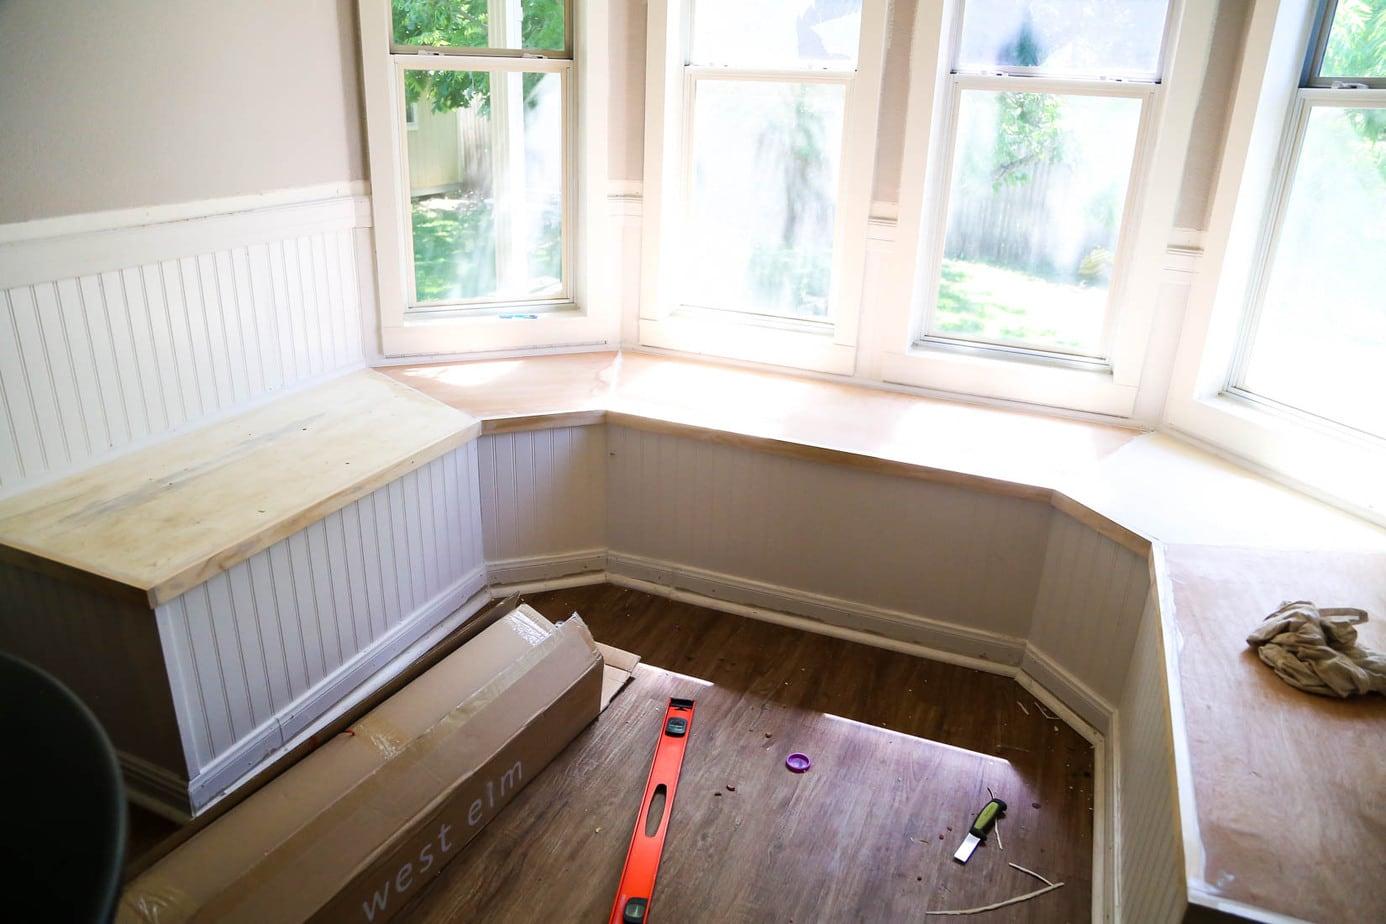 Installing trim on DIY build in window seat